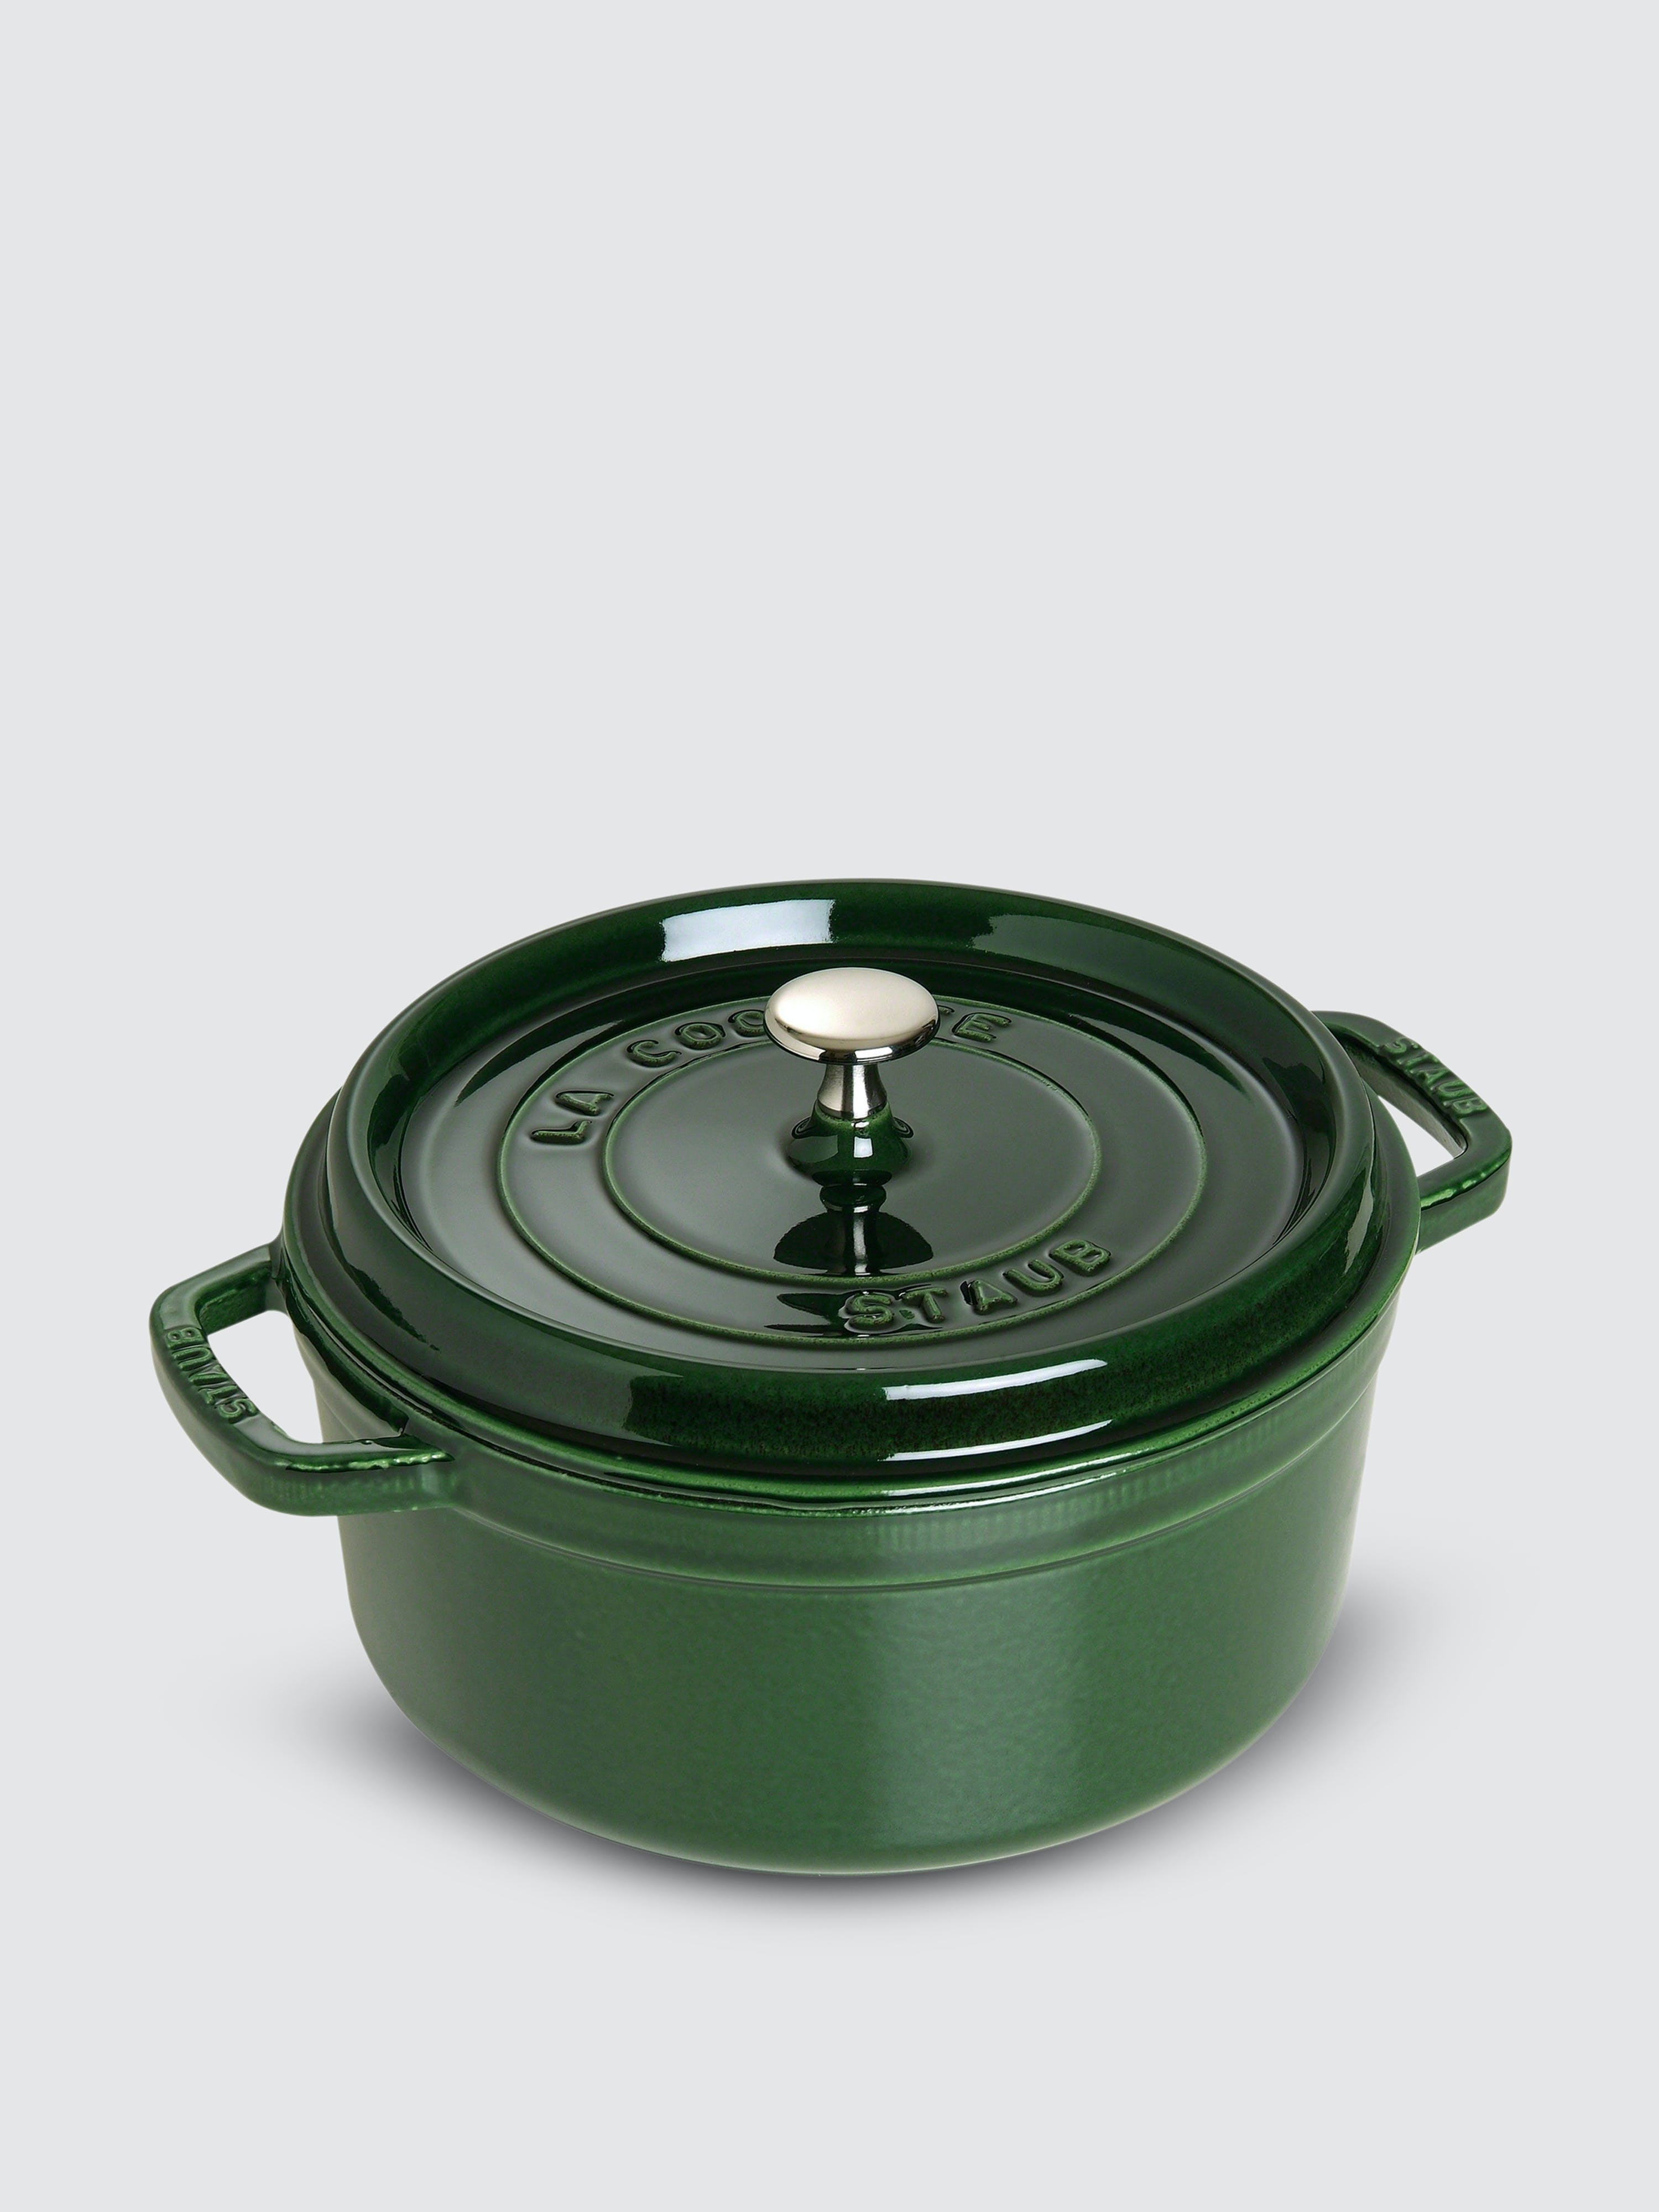 Staub 7-qt Round Cocotte In Basil